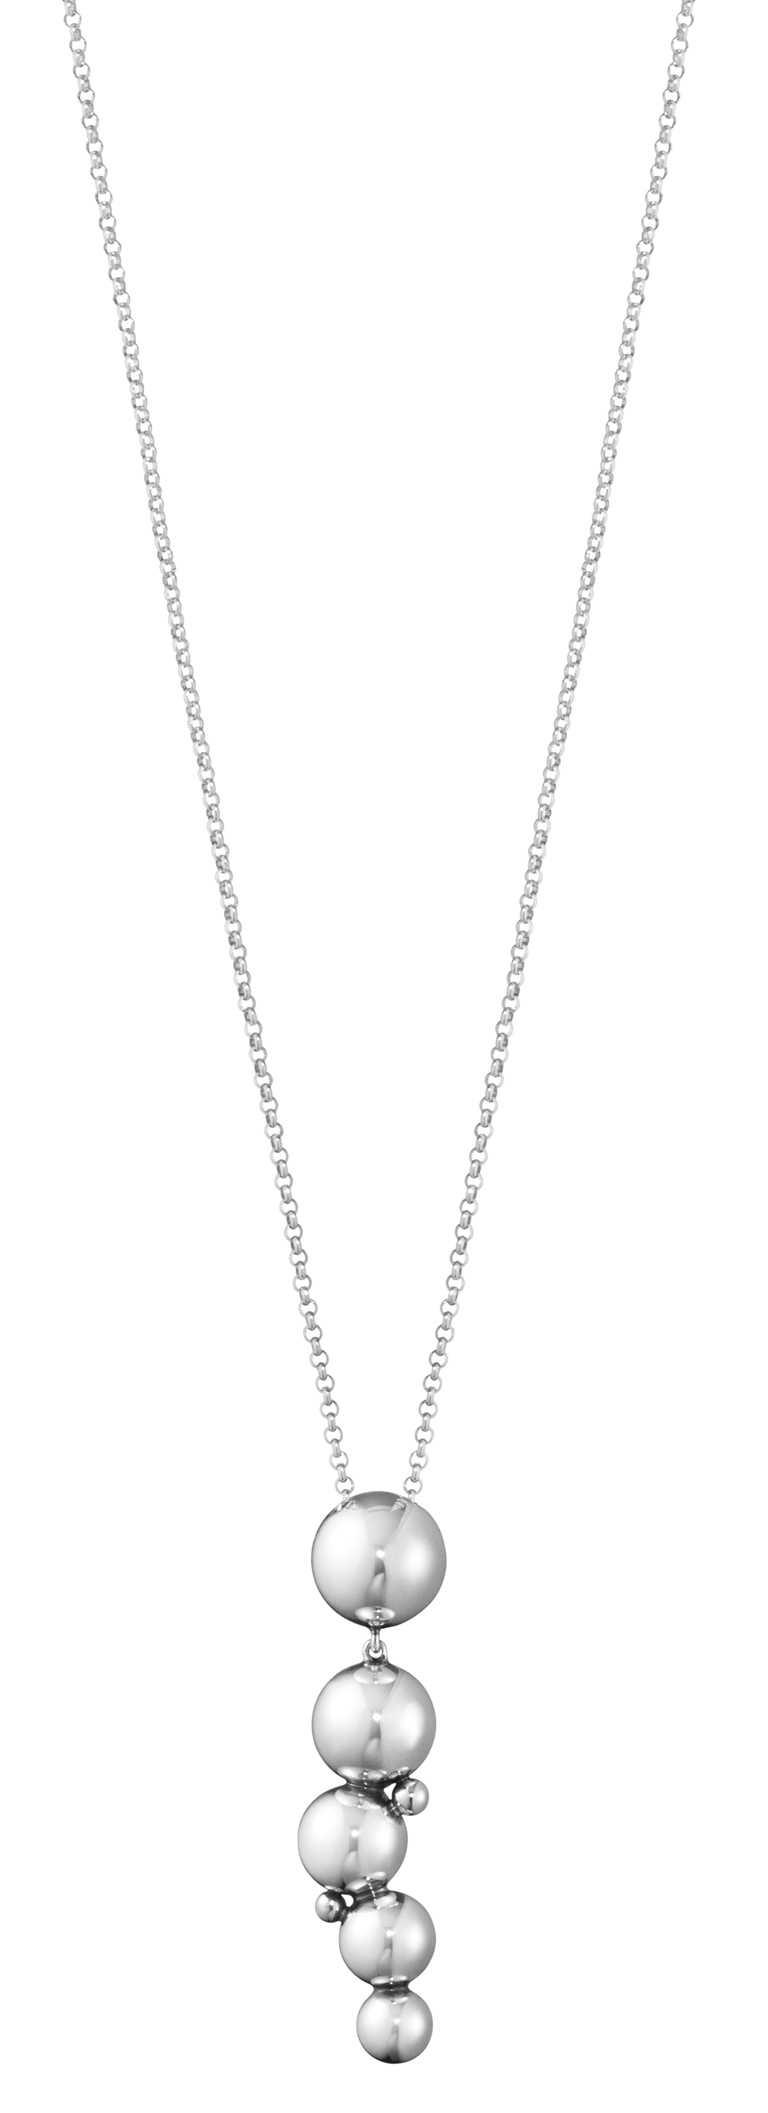 GEORG JENSEN「Moonlight Grapes月光葡萄」系列,純銀項鍊╱8,200元。(圖╱GEORG JENSEN提供)